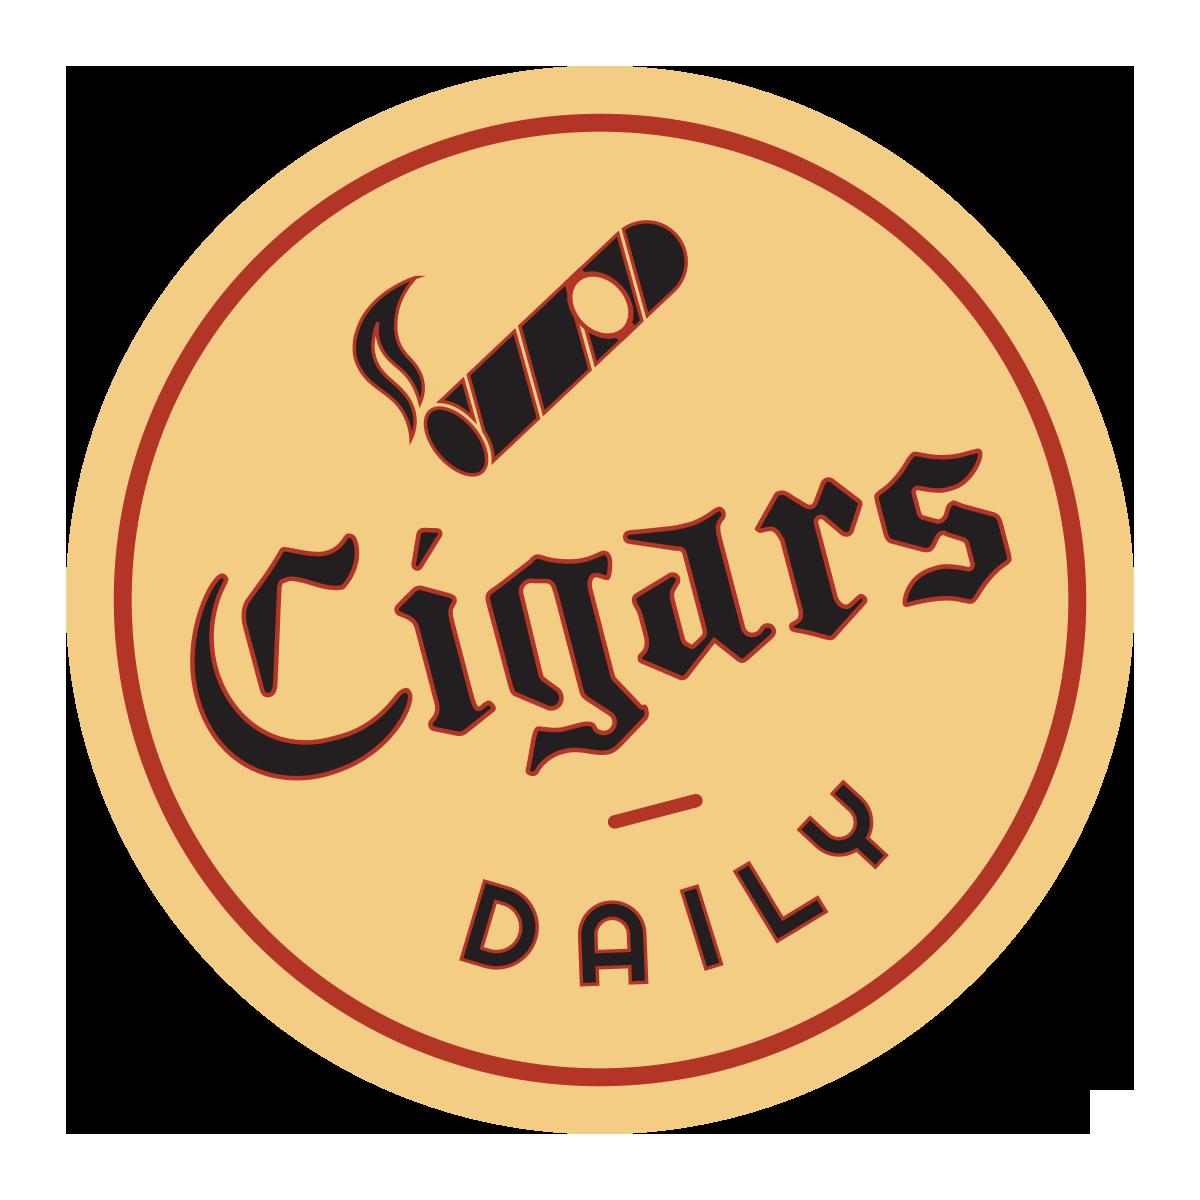 Cigars Daily